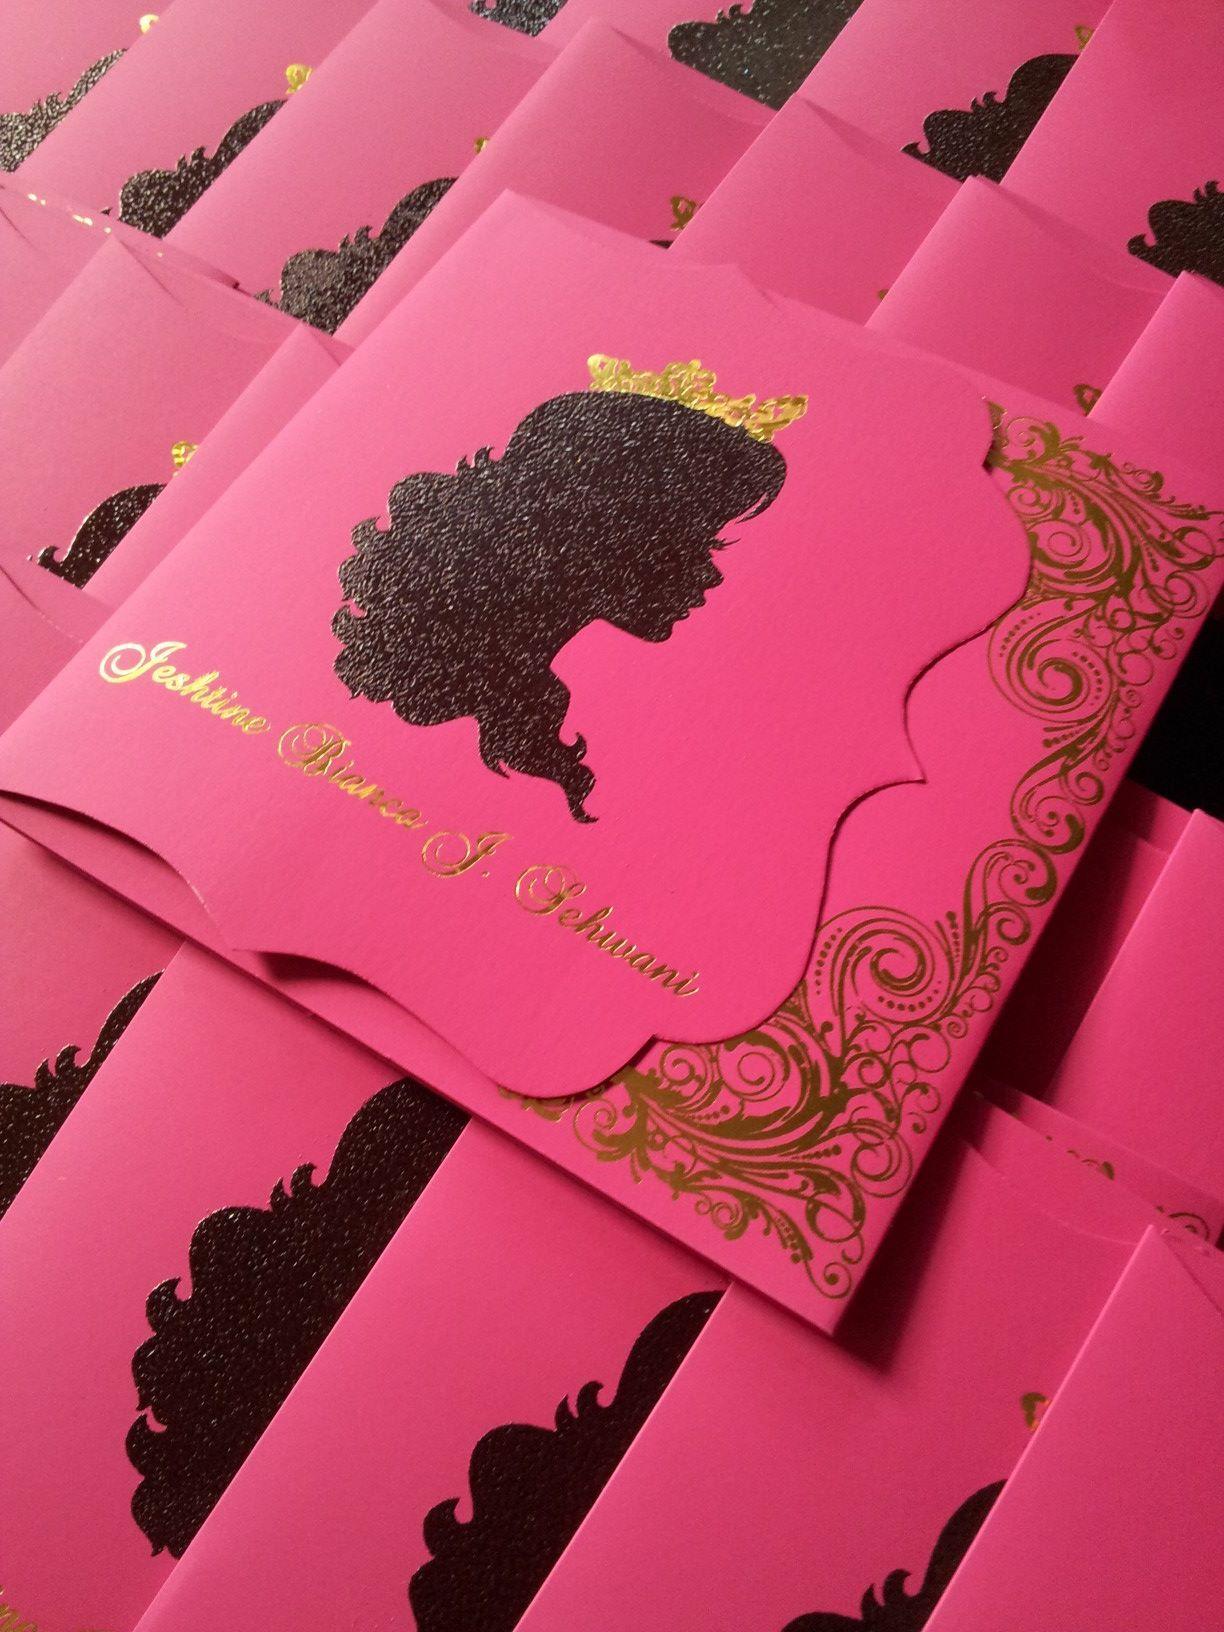 Princess debut debut ideas pinterest princess debut ideas princess debut stopboris Image collections